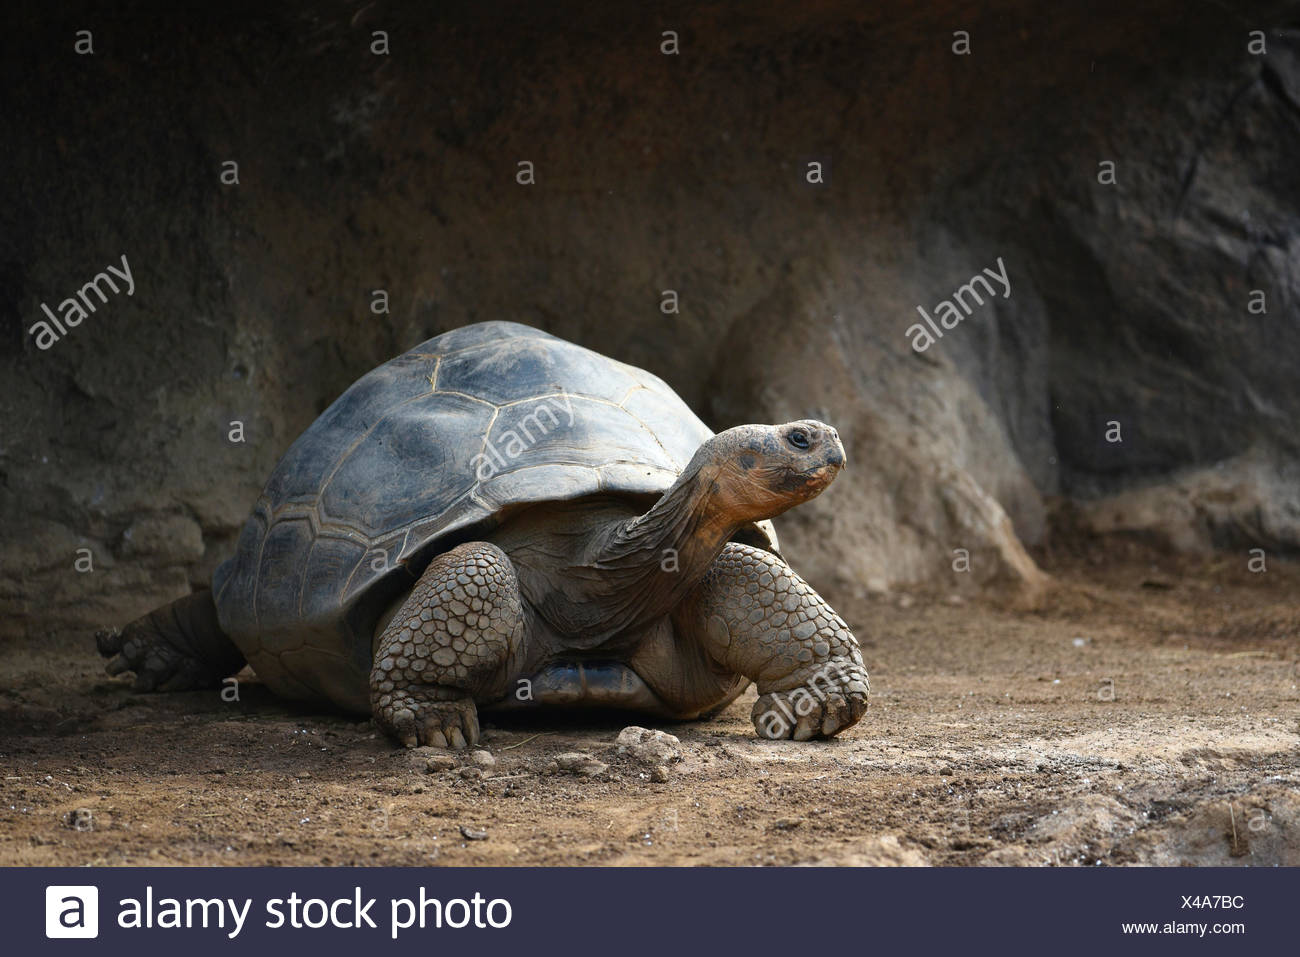 Galápagos giant tortoise (Chelonoidis nigra), Loro Parque, Puerto de la Cruz, Tenerife, Canary Islands, Spain - Stock Image